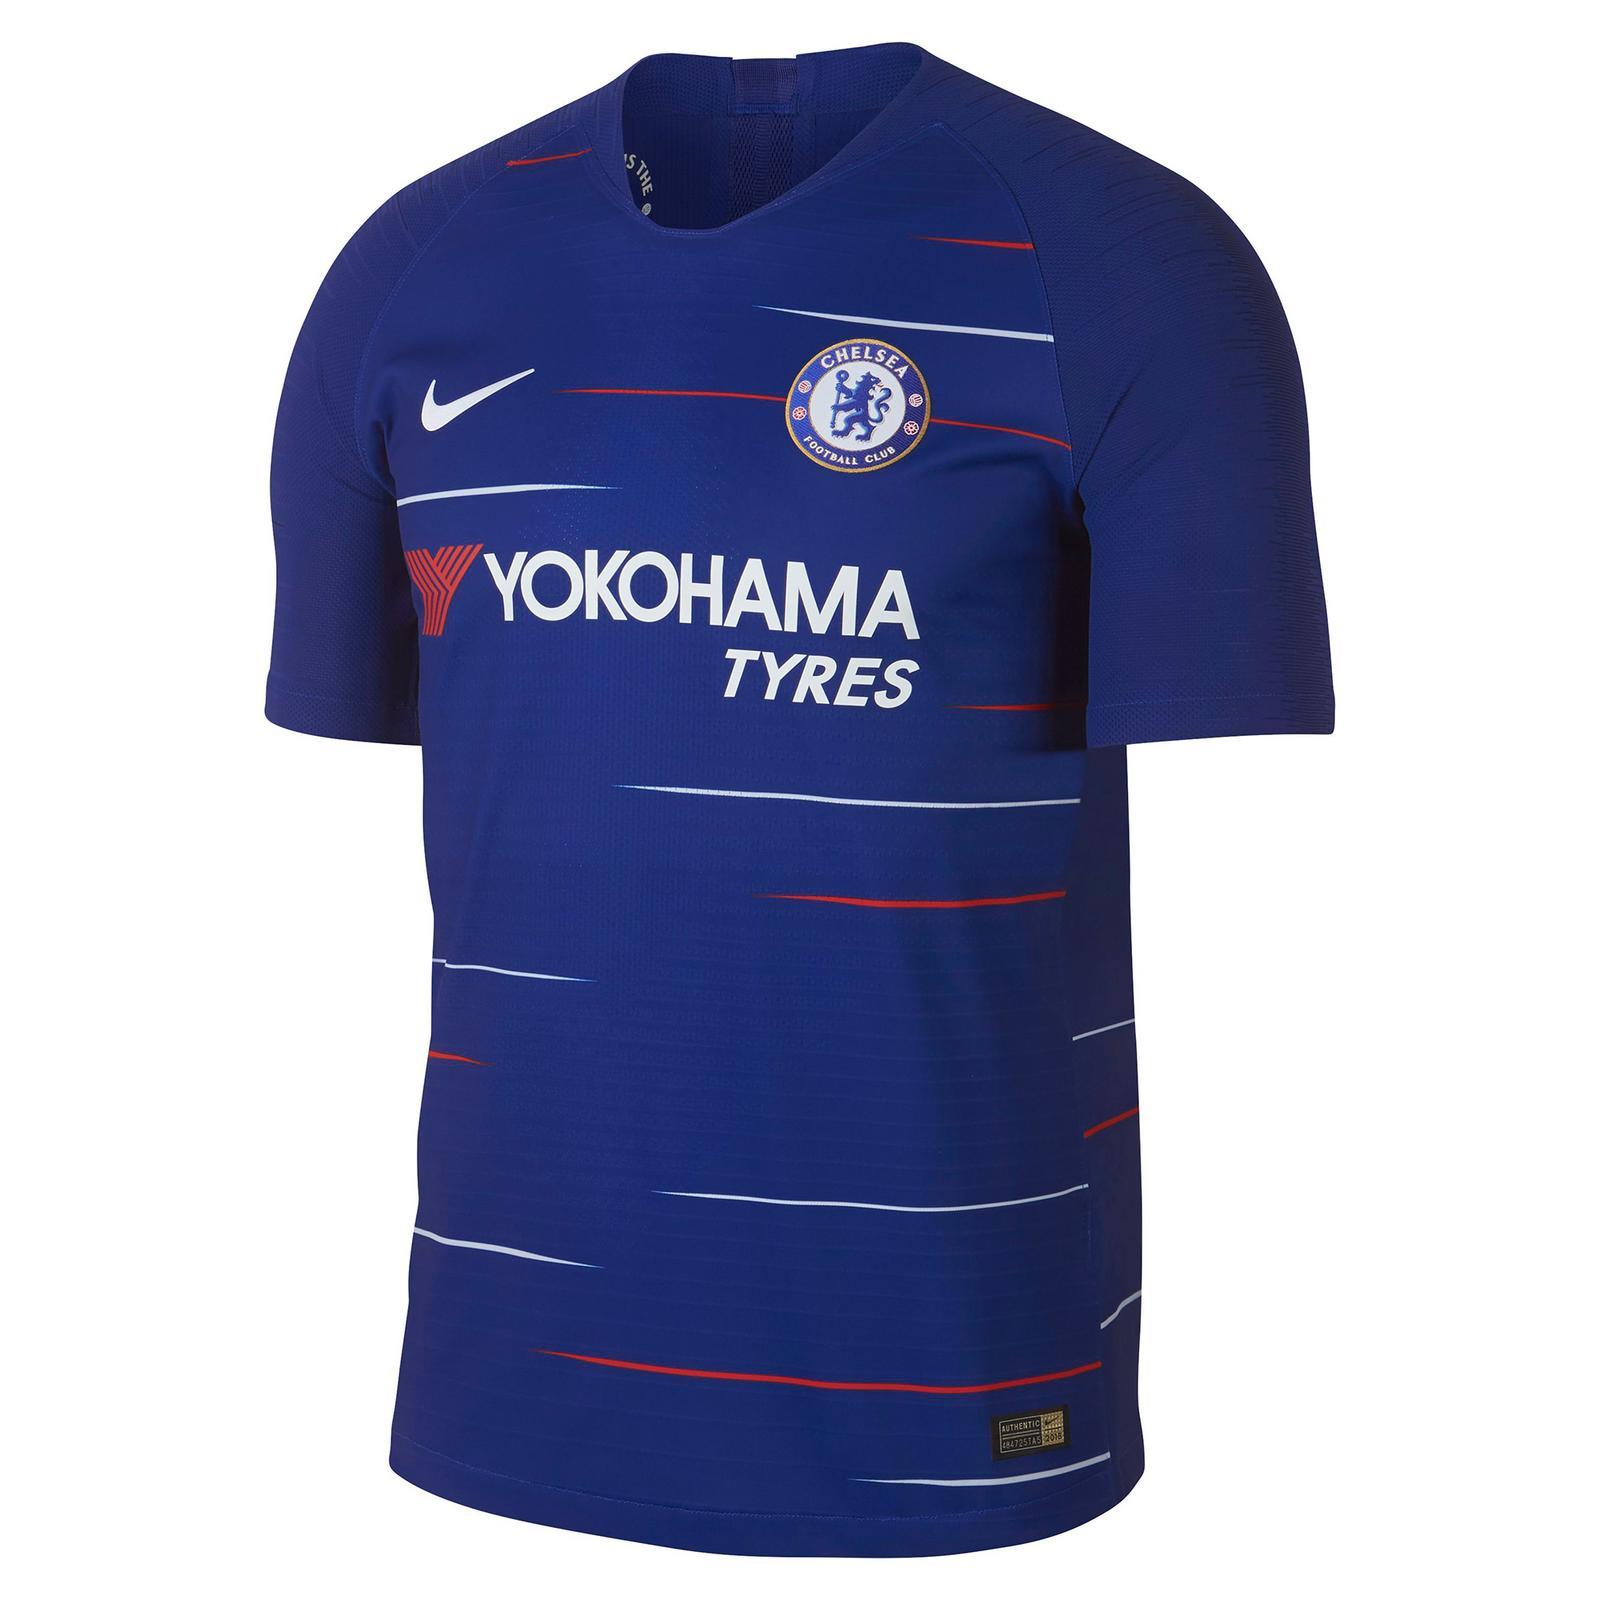 Camiseta del Chelsea (NIKE). 34e0c2f5e44d4